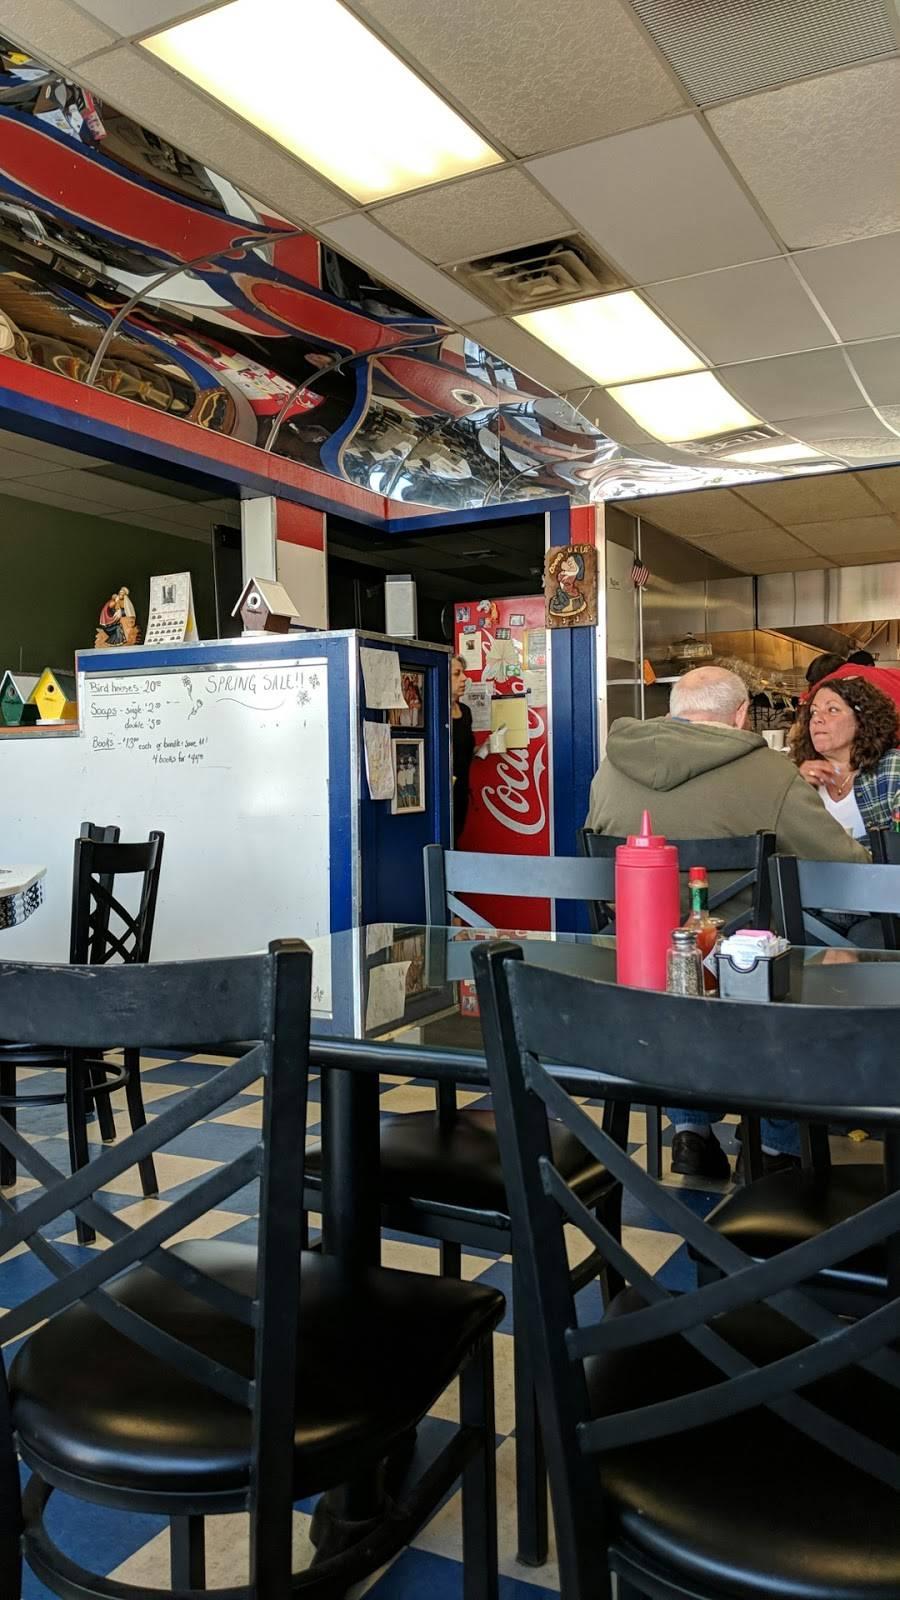 Destinys Diner | restaurant | 20 Gooding Ave, Bristol, RI 02809, USA | 4013965510 OR +1 401-396-5510